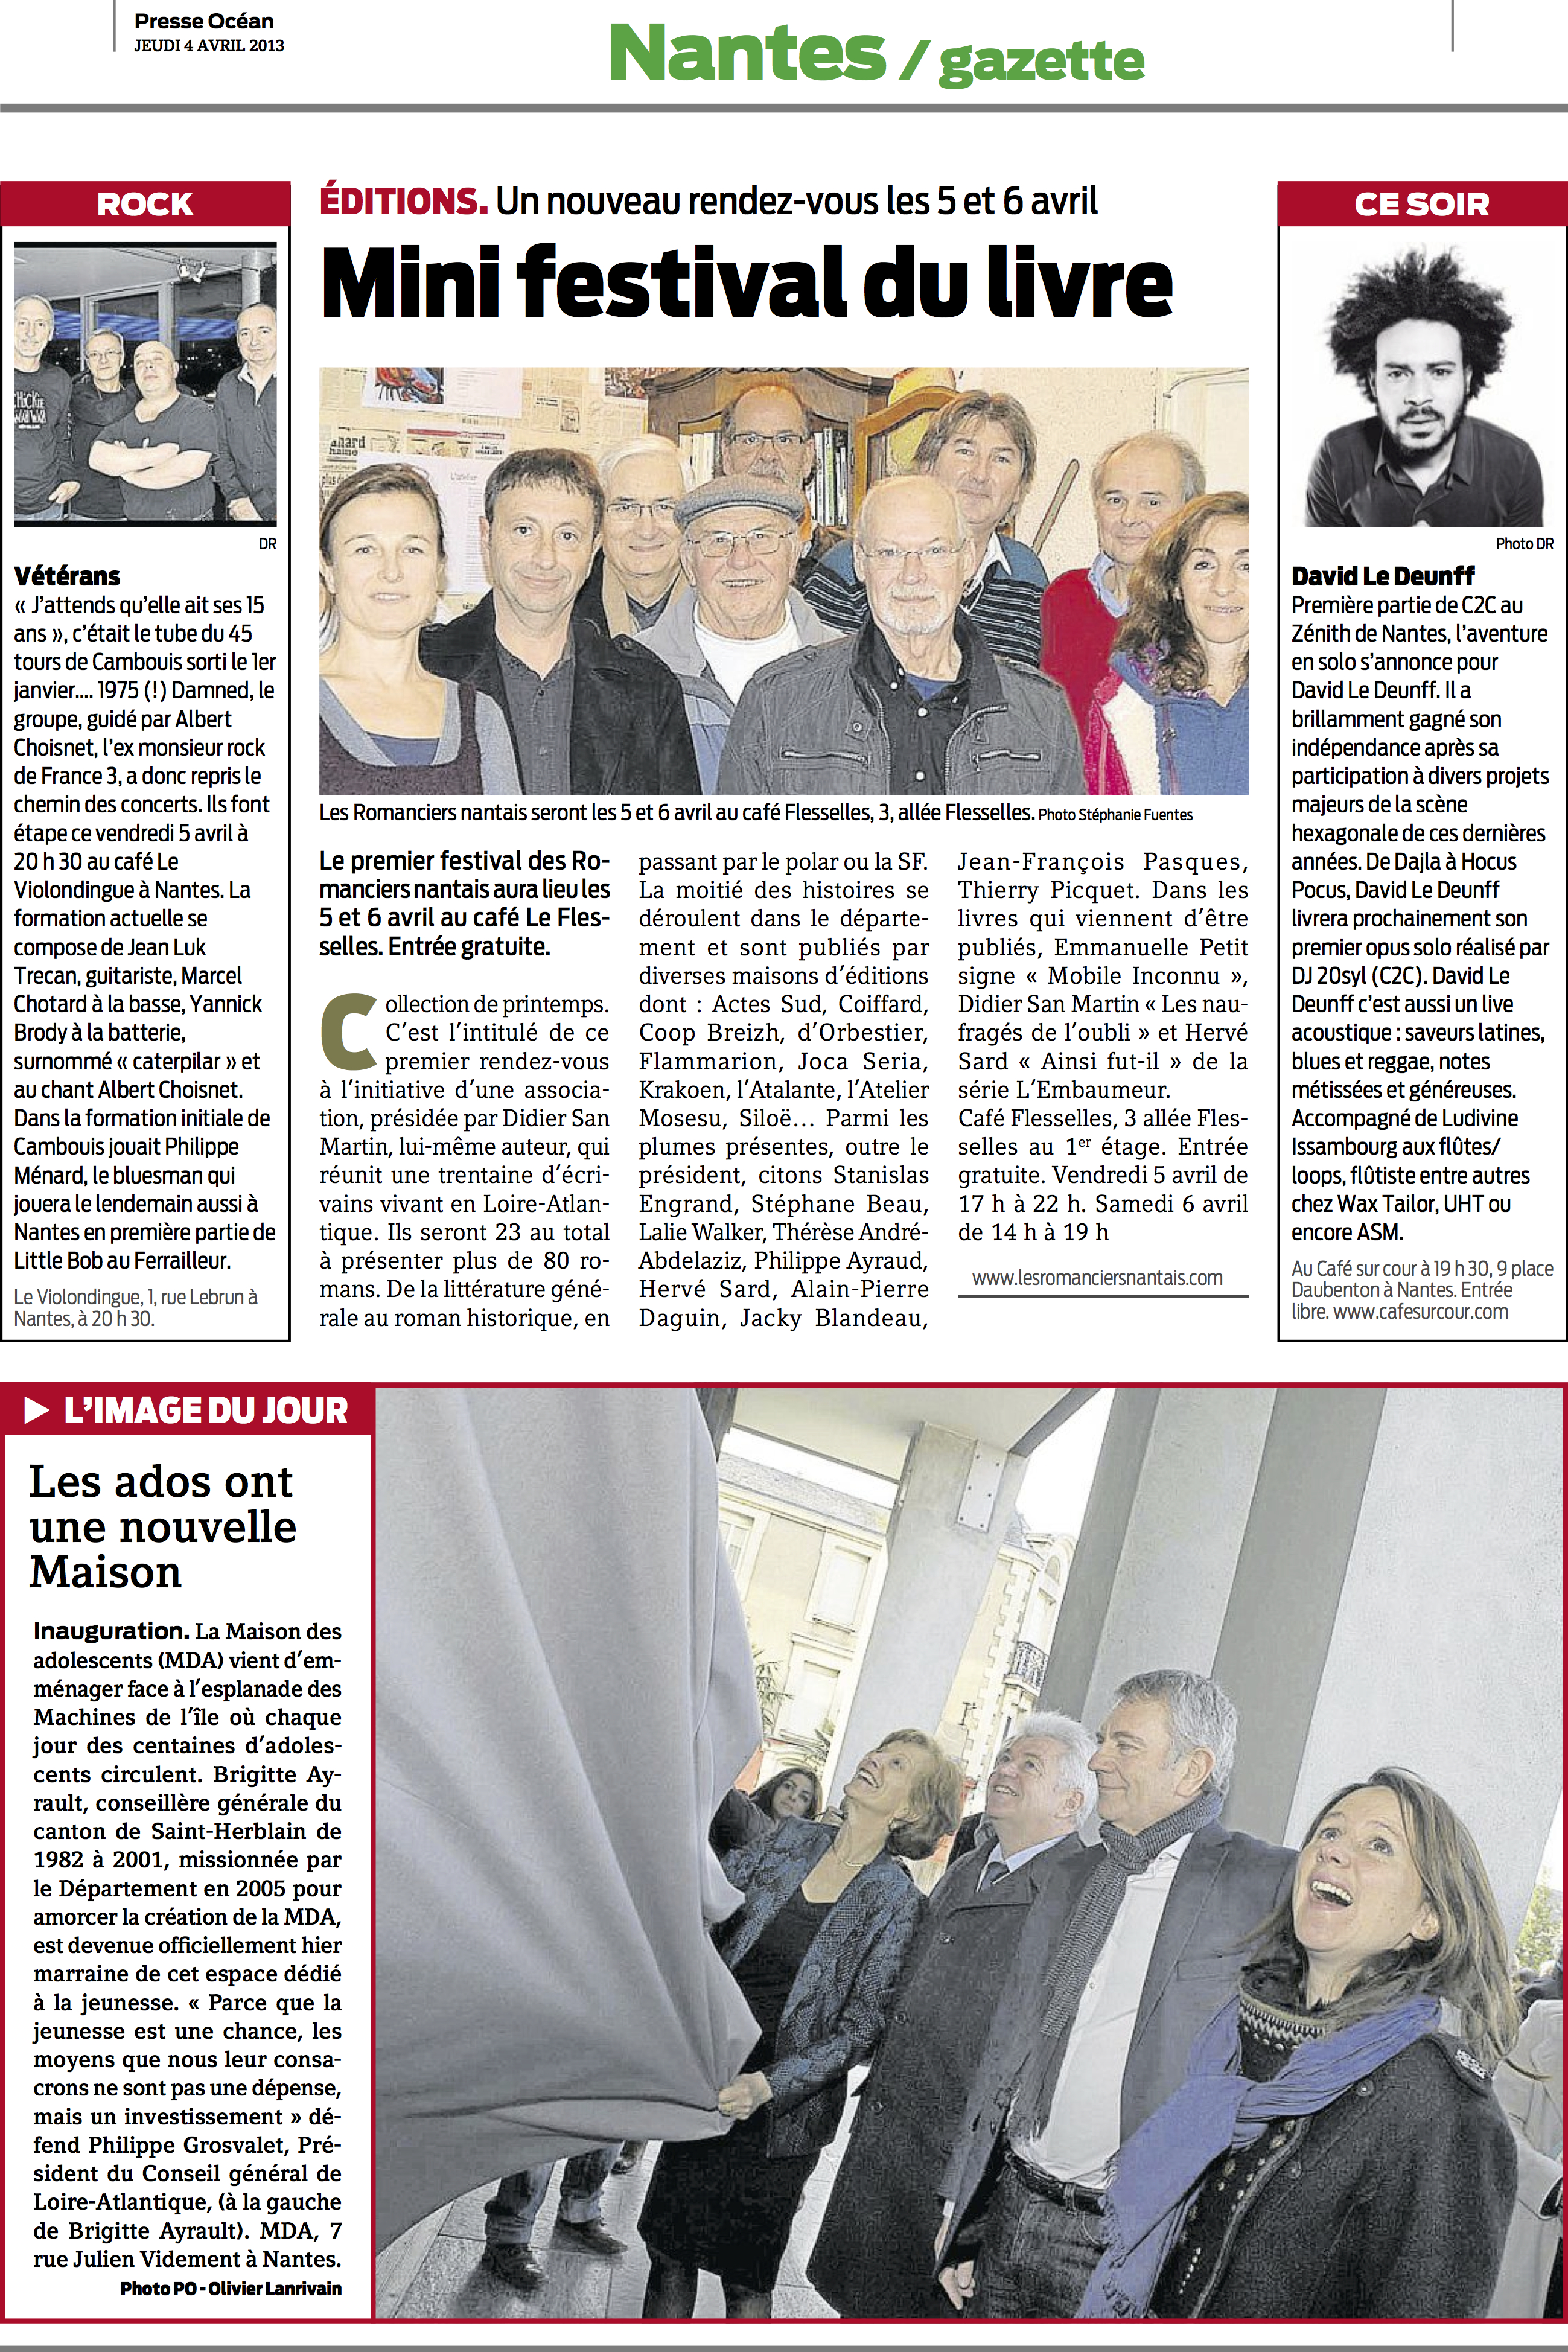 Presse Océan 4 avril 2013